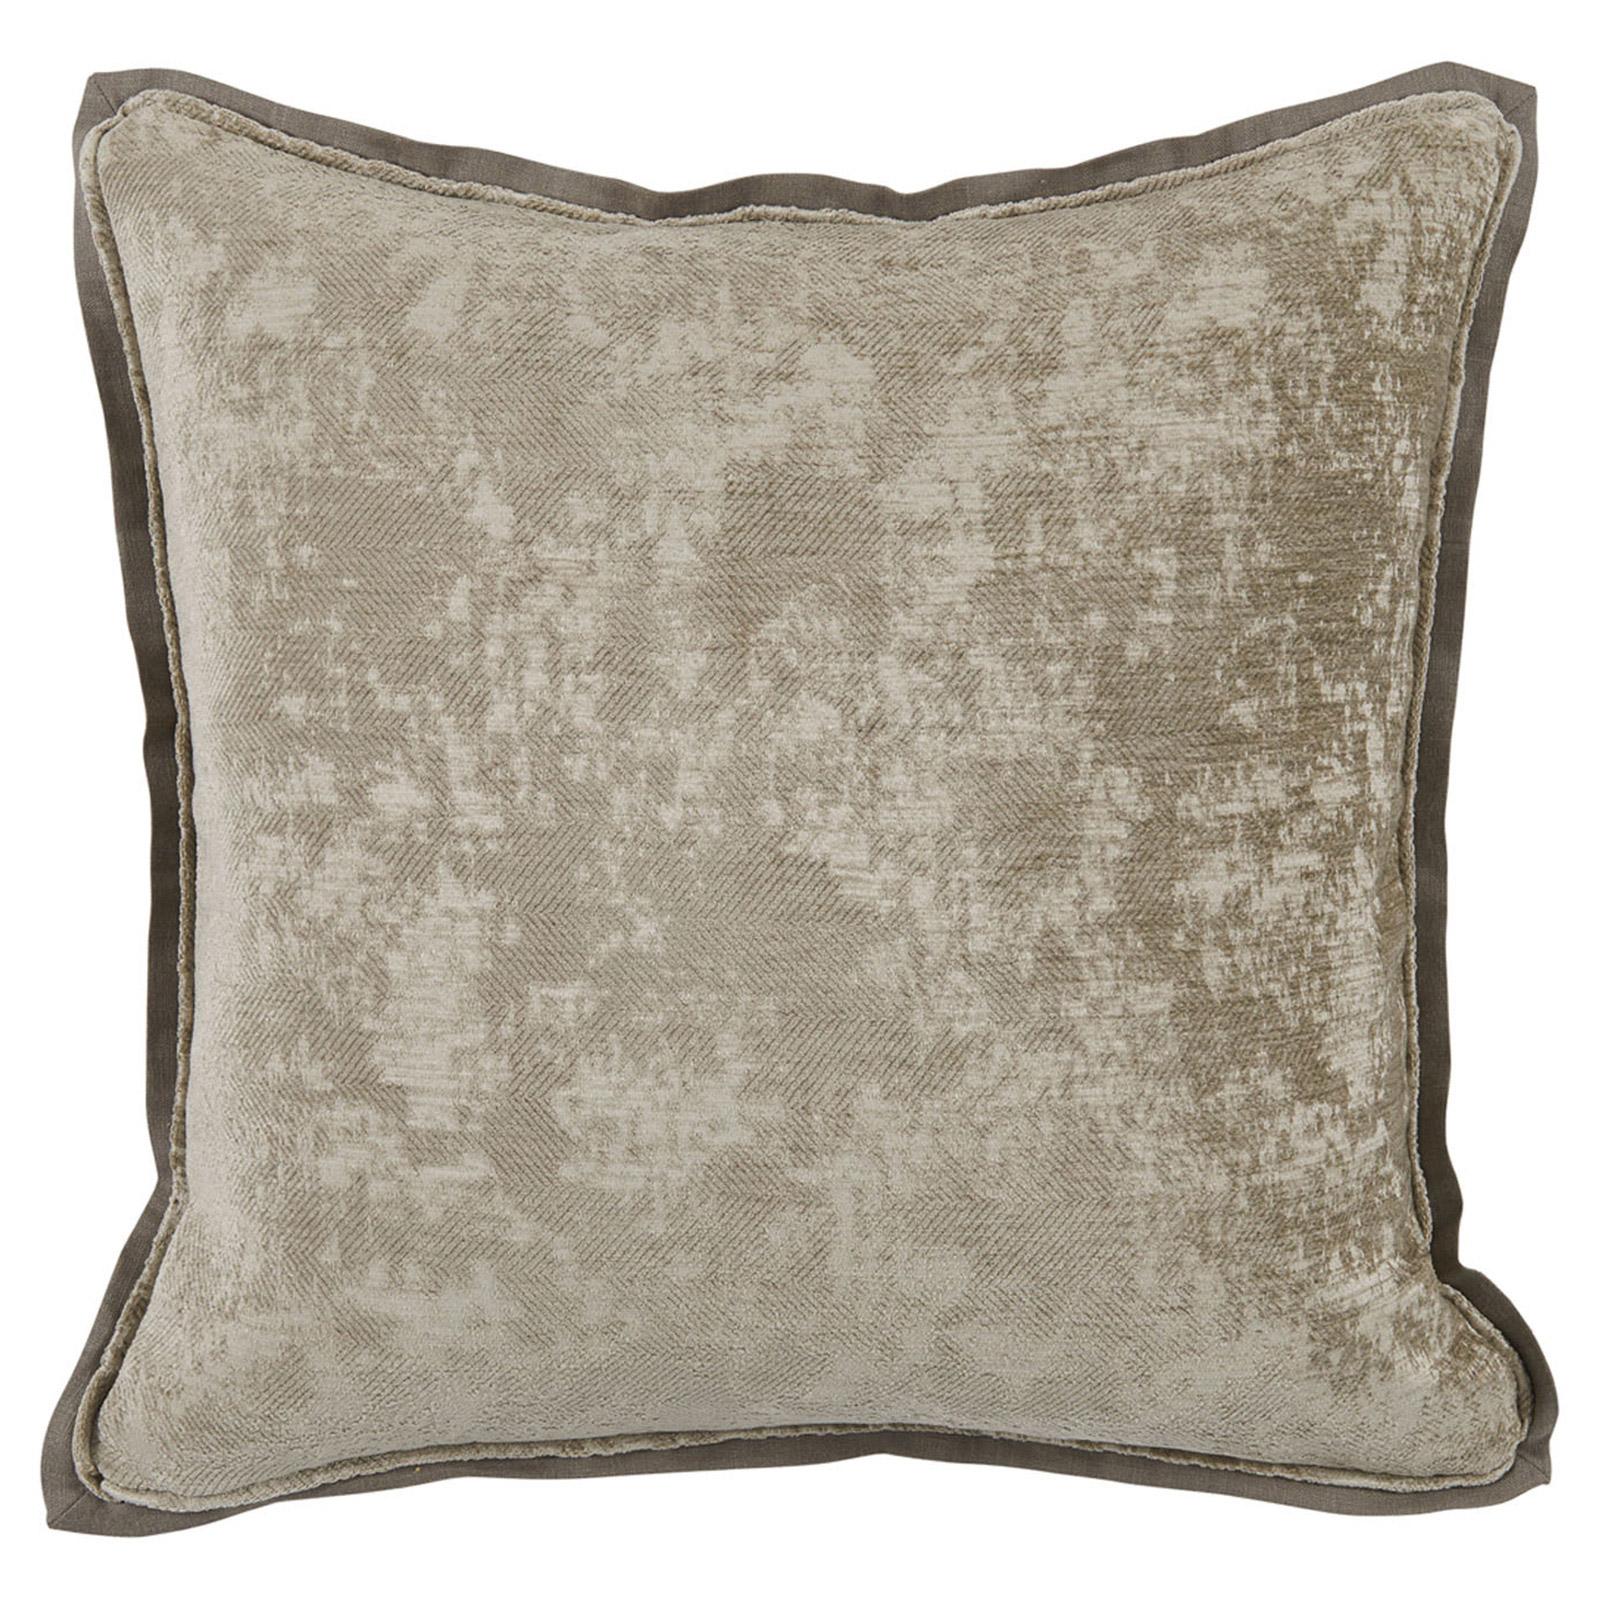 Harriet Regency Washed Herringbone Grey Pillow - 22x22